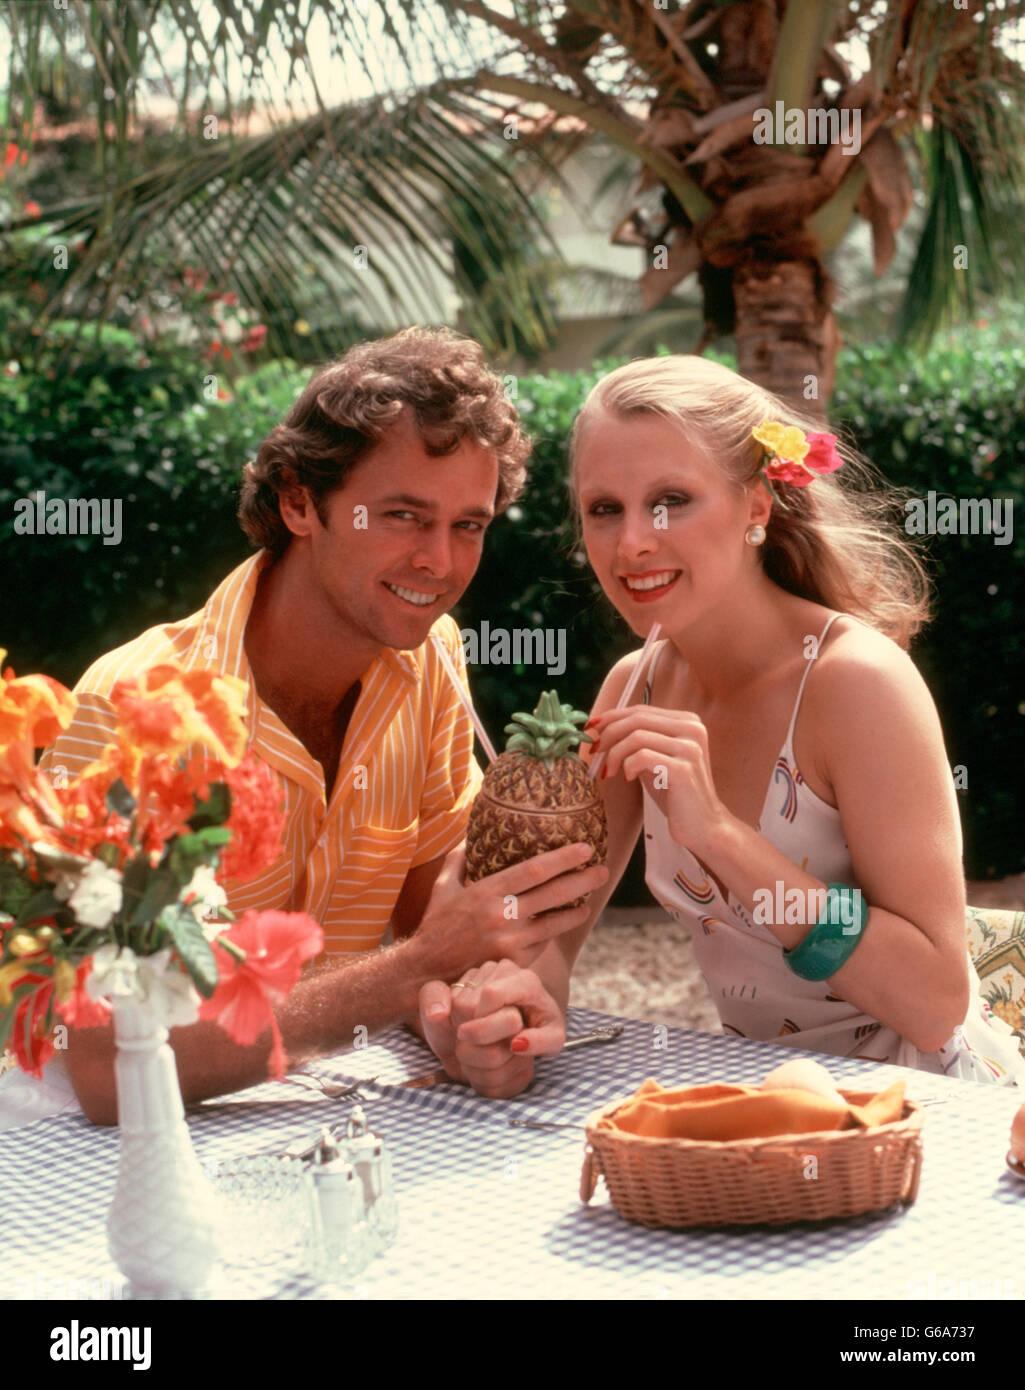 1980 SMILING COUPLE DRINKING COCKTAIL HORS D'UN VERRE EN FORME D'ANANAS TROPICAL EN CAFE Photo Stock